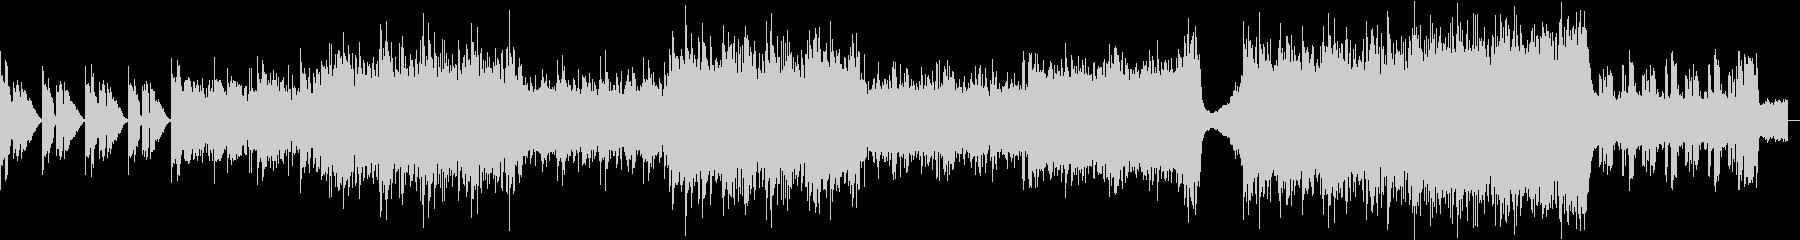 DIGI ROCK - BigBeatの未再生の波形